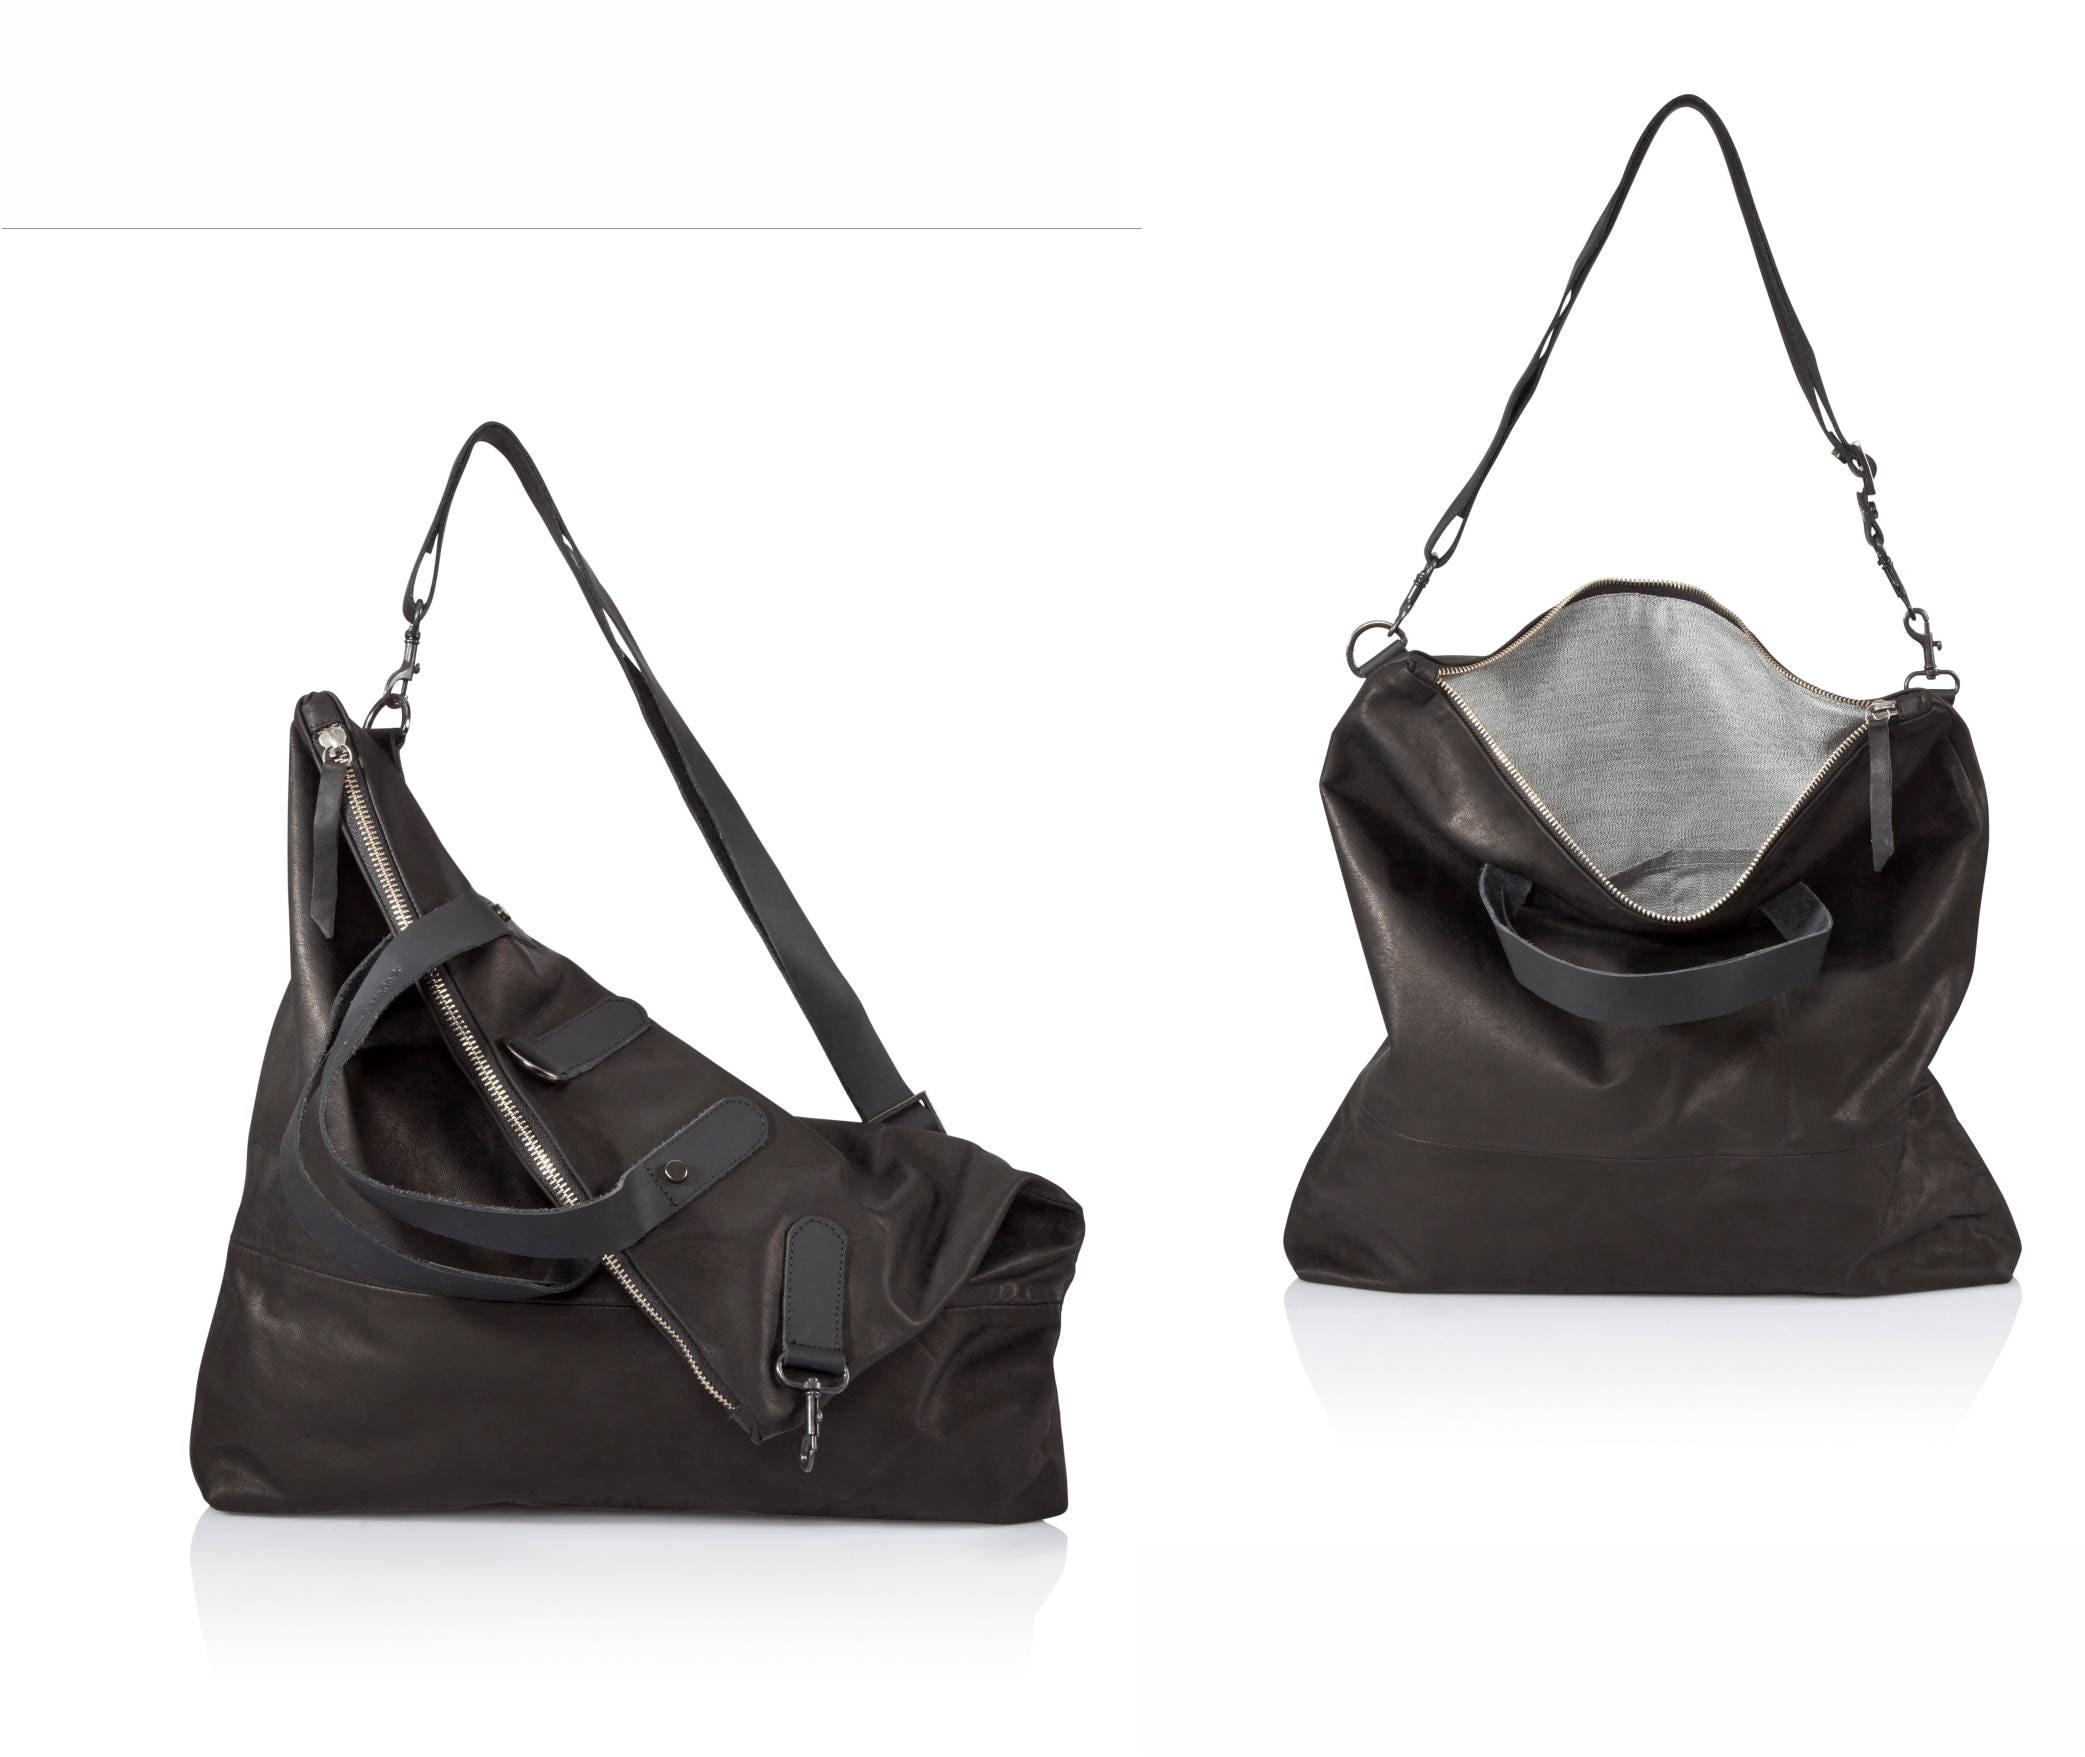 49c05633b9be Black Leather crossbody bag Convertible Leather sling bag